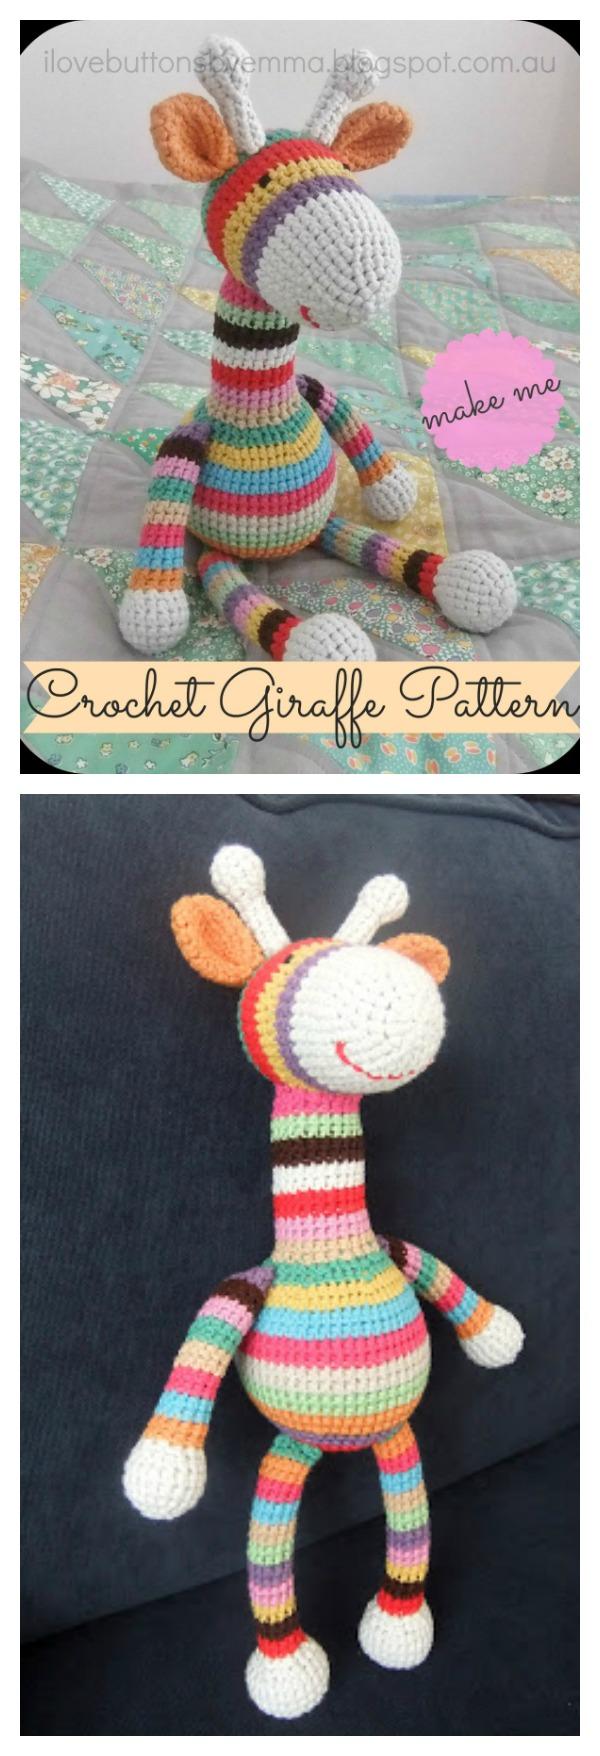 Adorable Crochet Hearty Giraffe Amigurumi Free Pattern